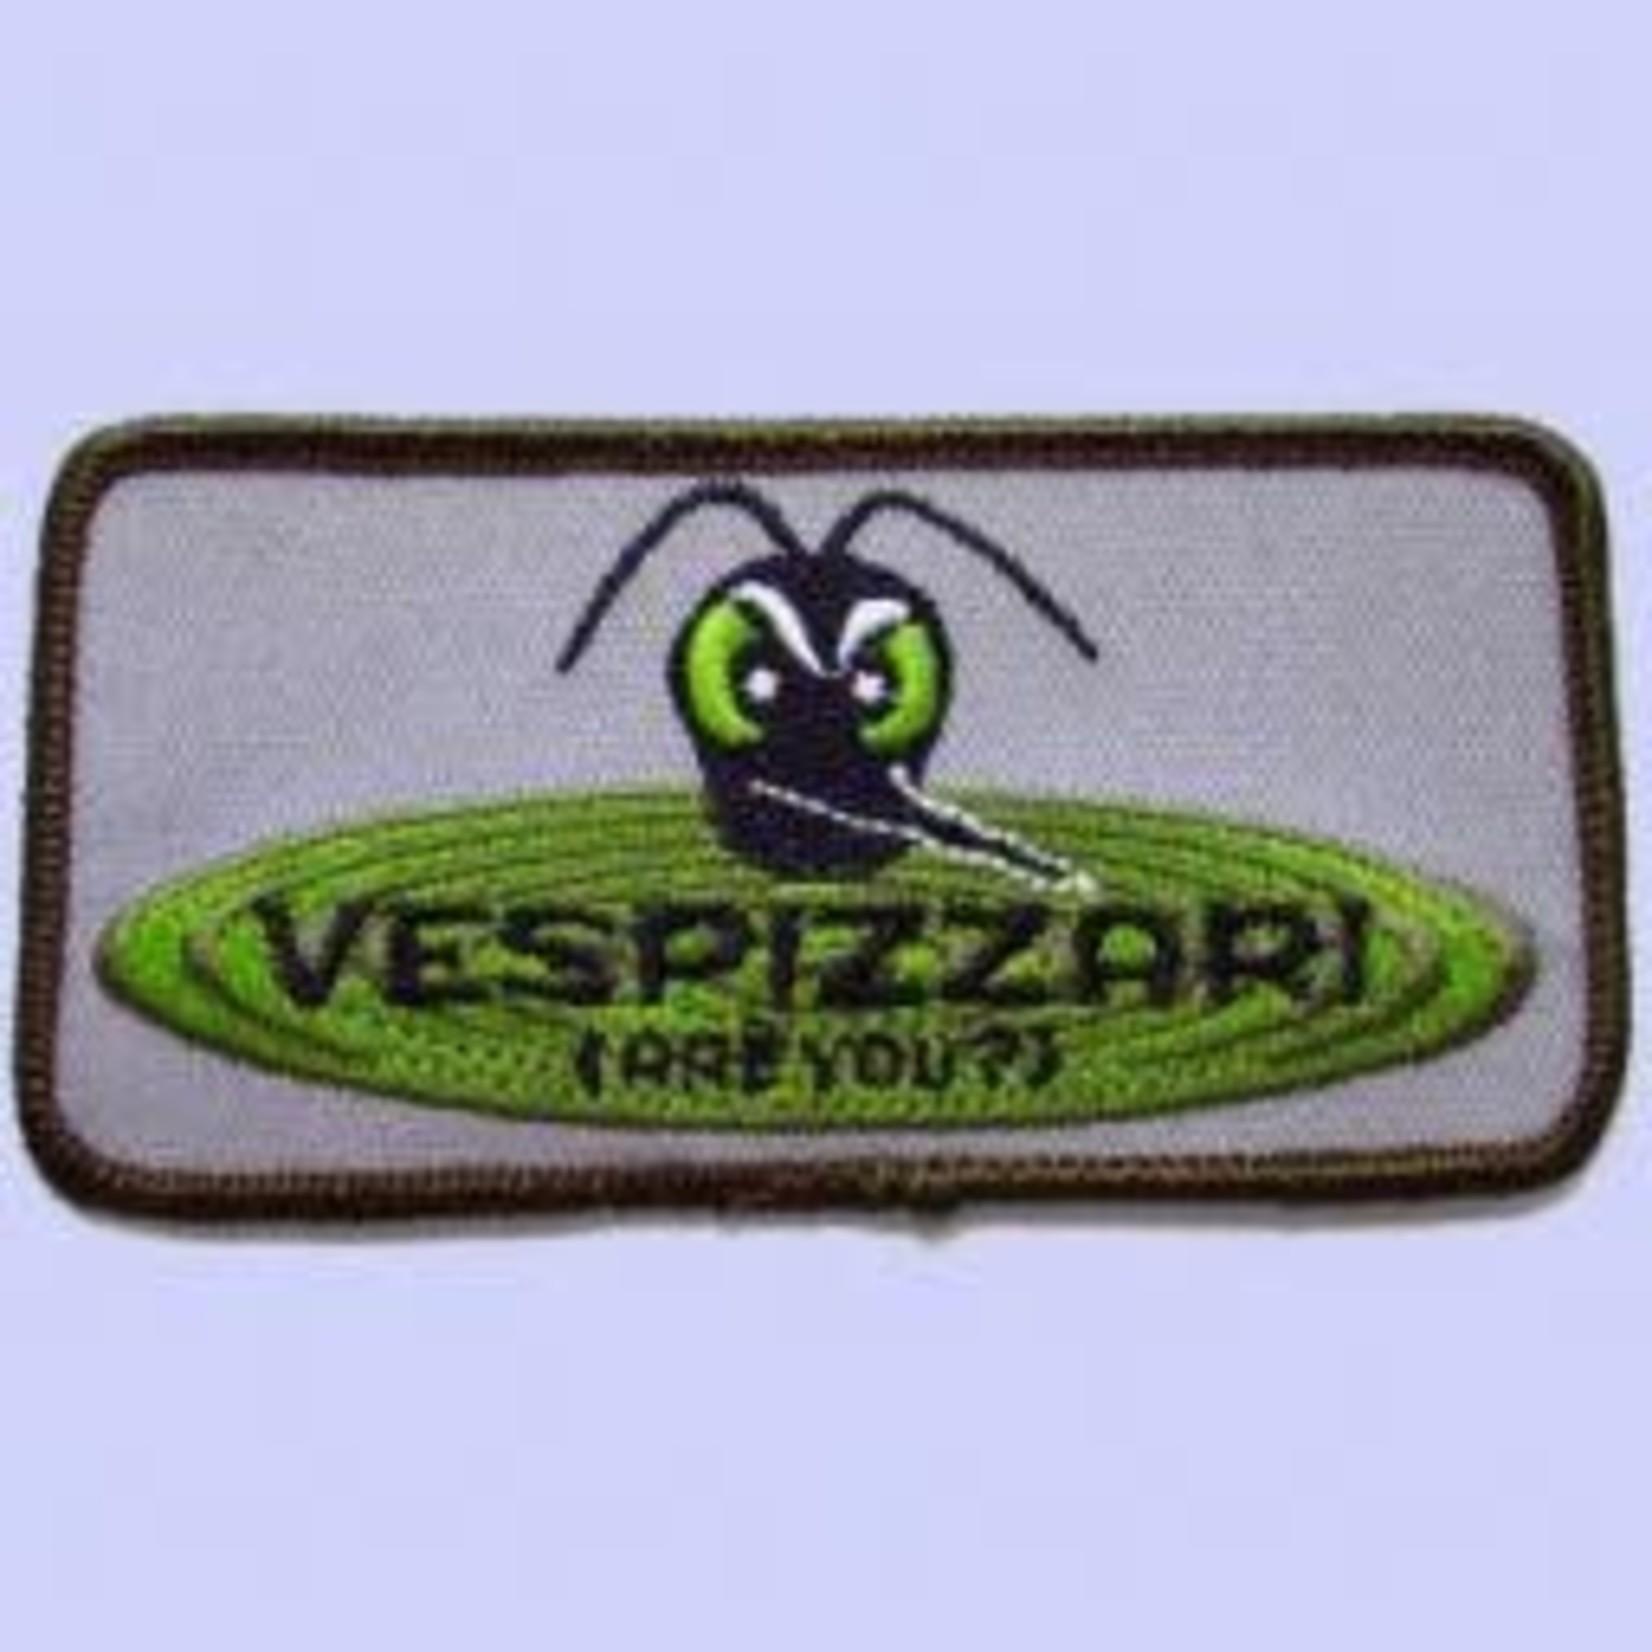 Lifestyle Patch, Vespizzari